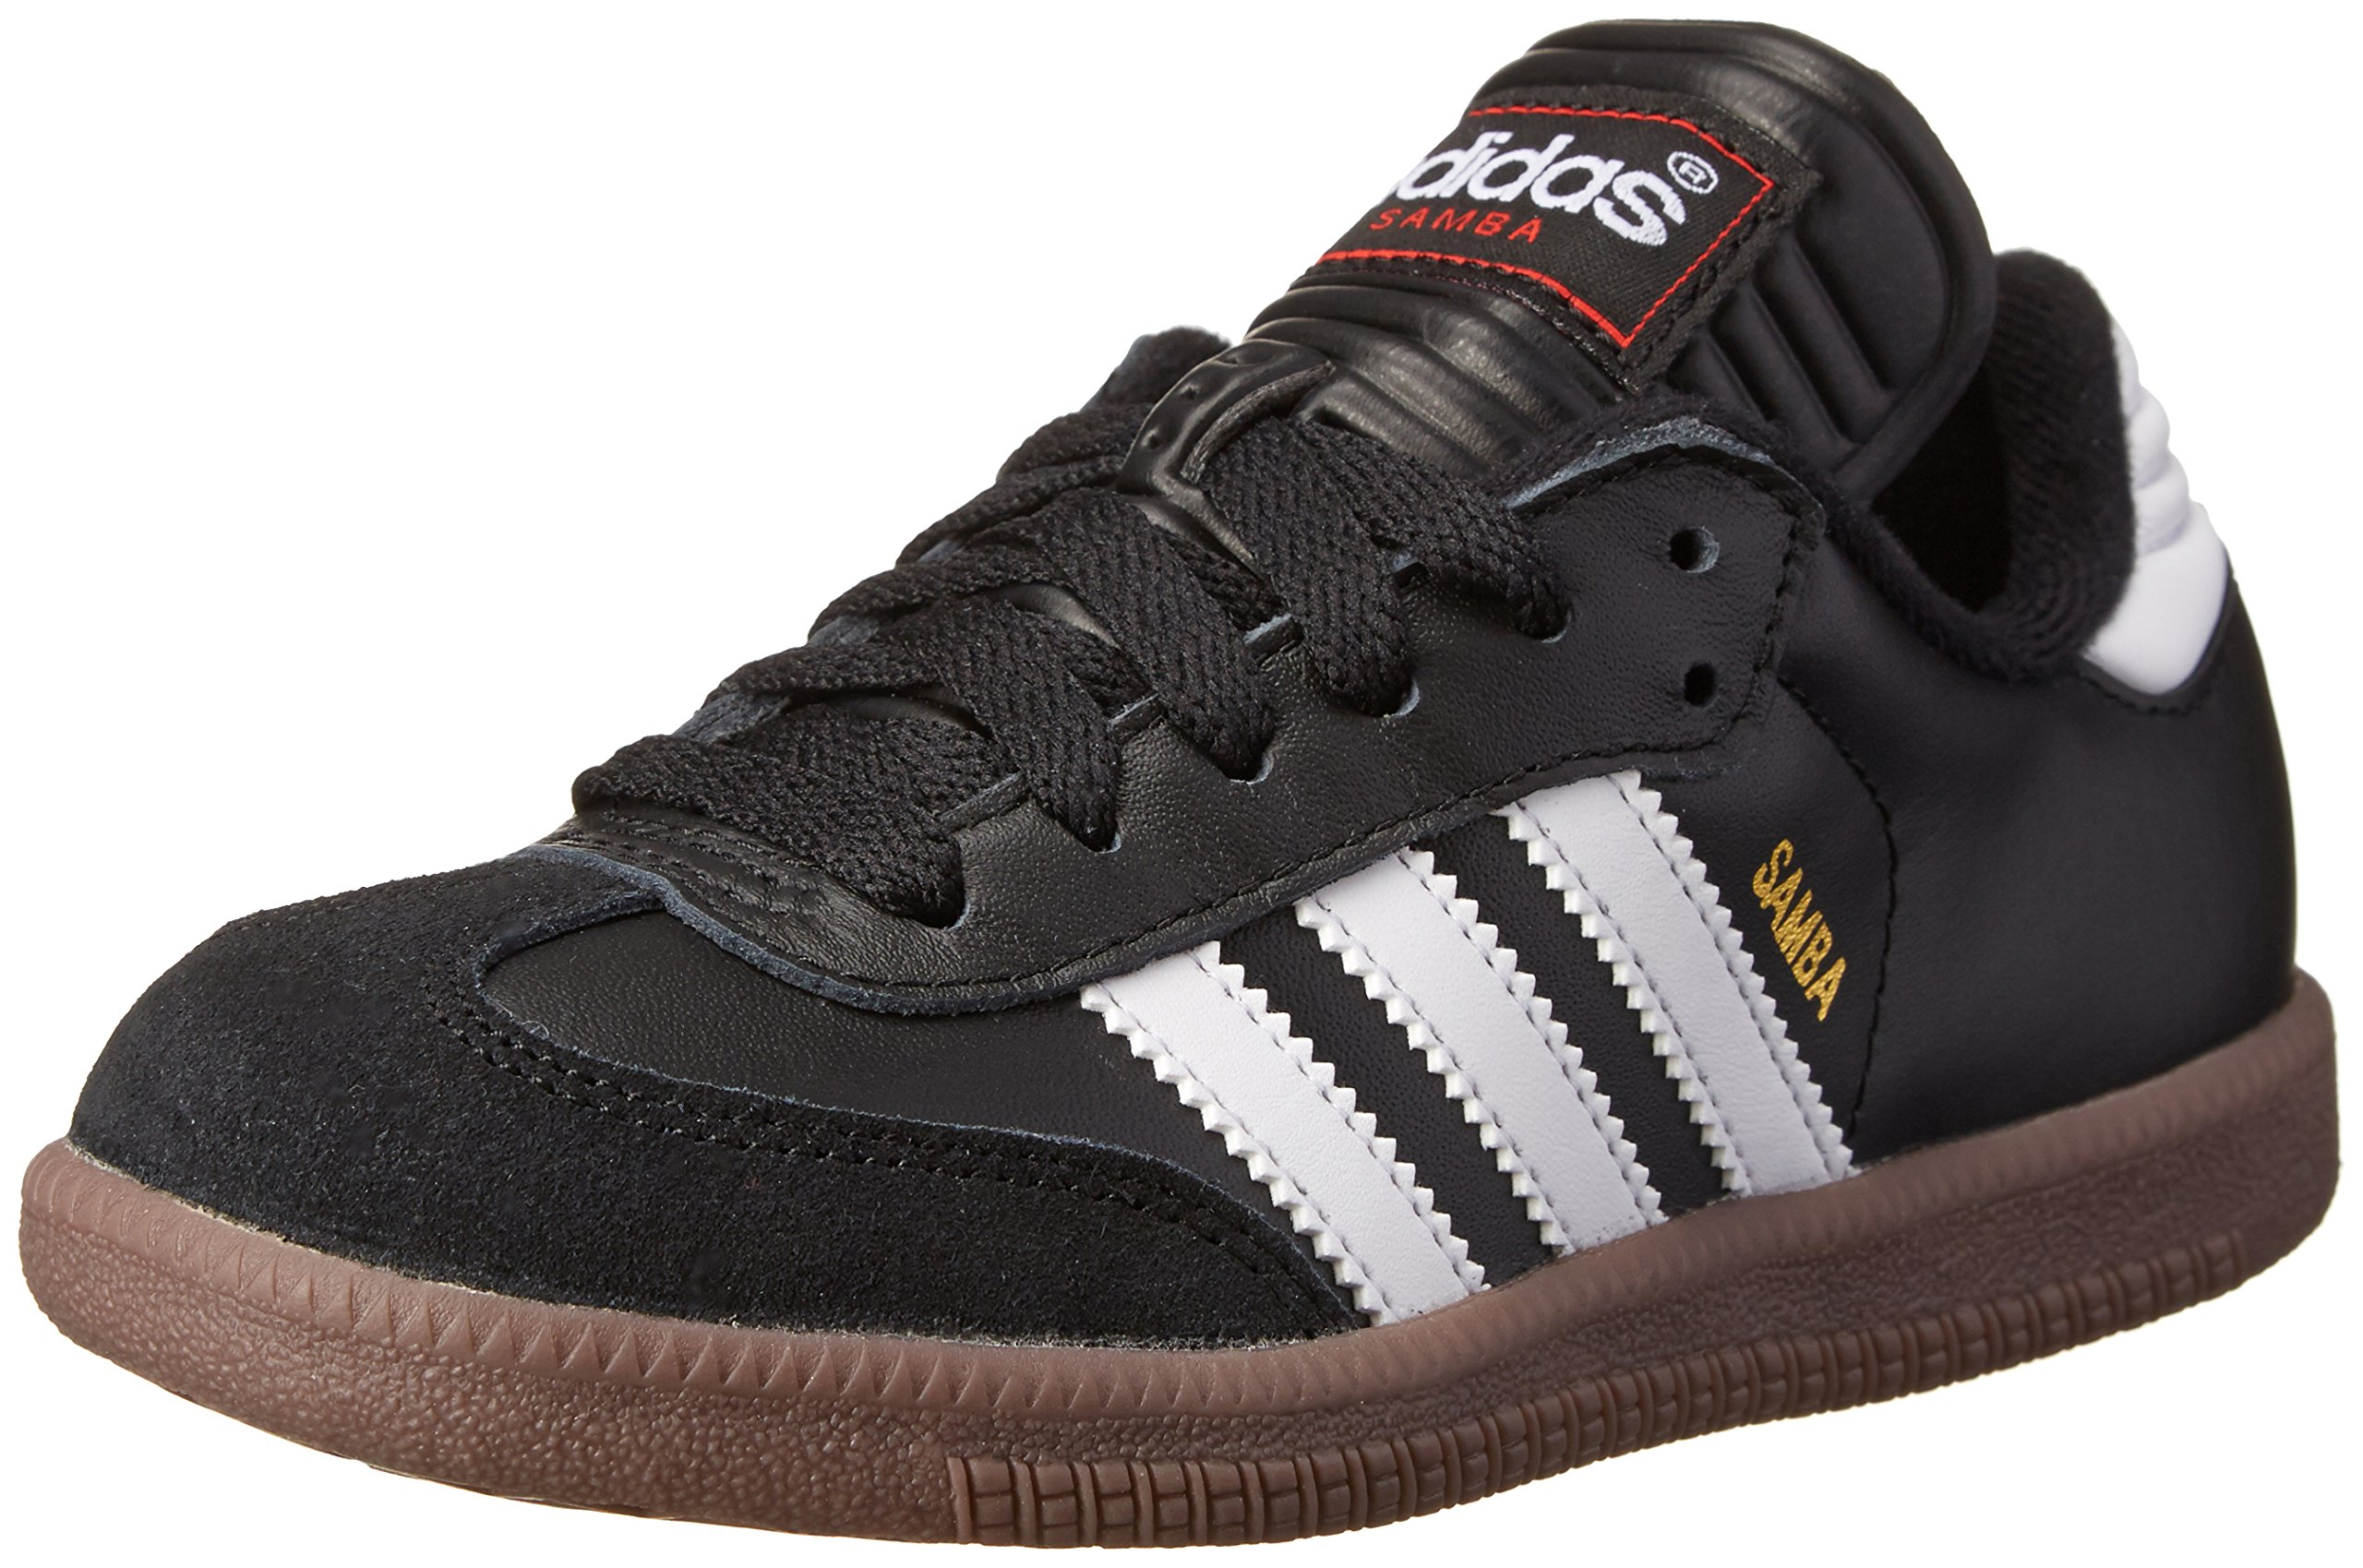 adidas Samba Classic Soccer Shoe, Black/White, 10K M US Big Kid